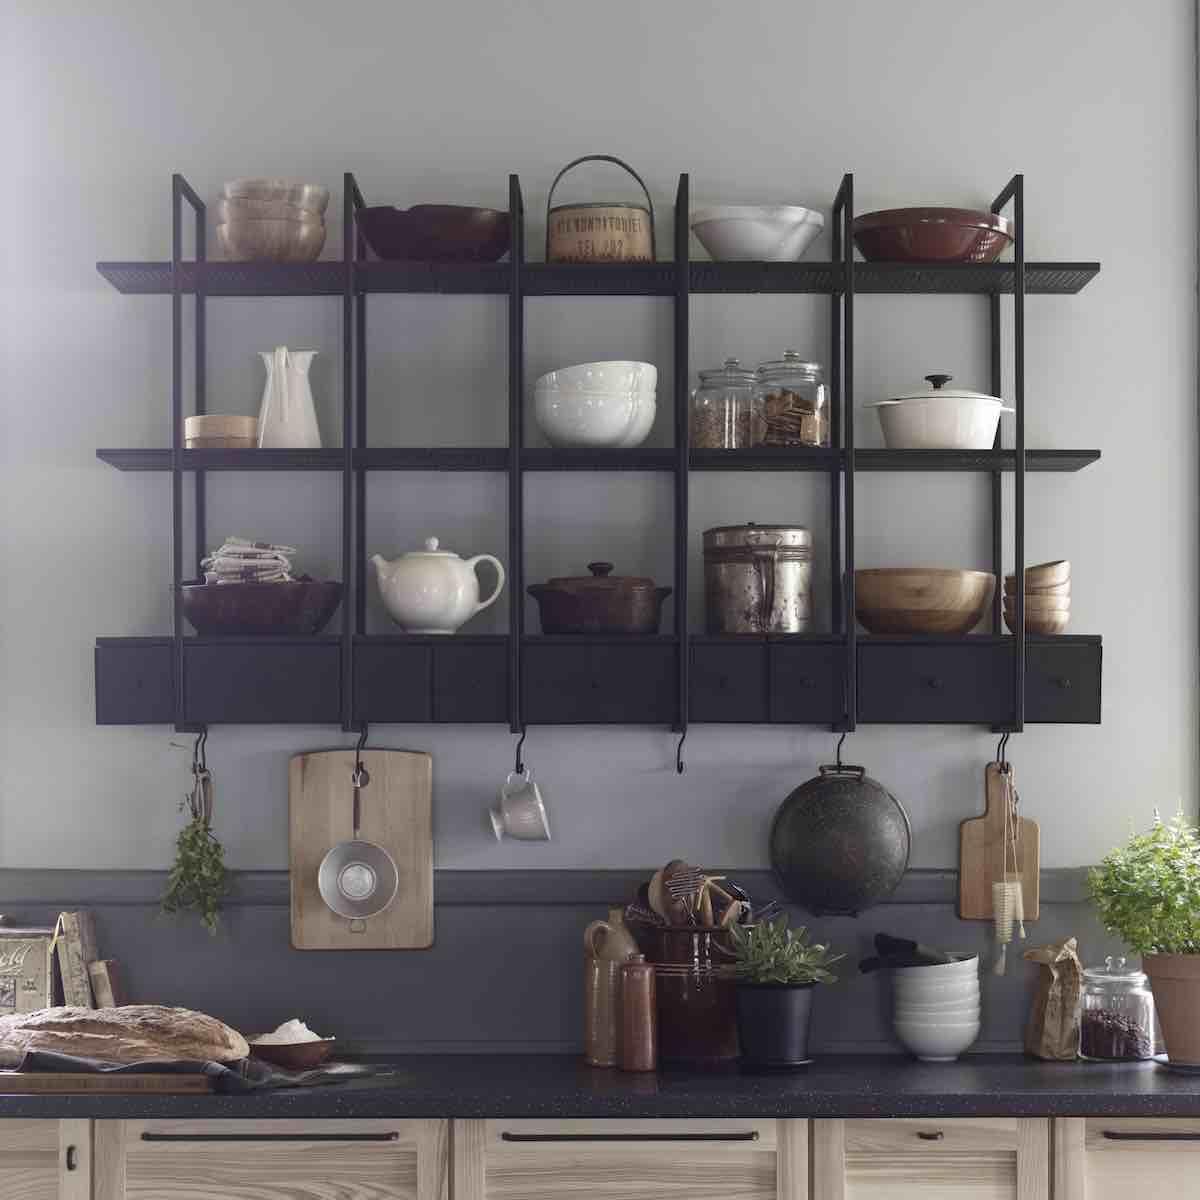 IKEA Küchenregal